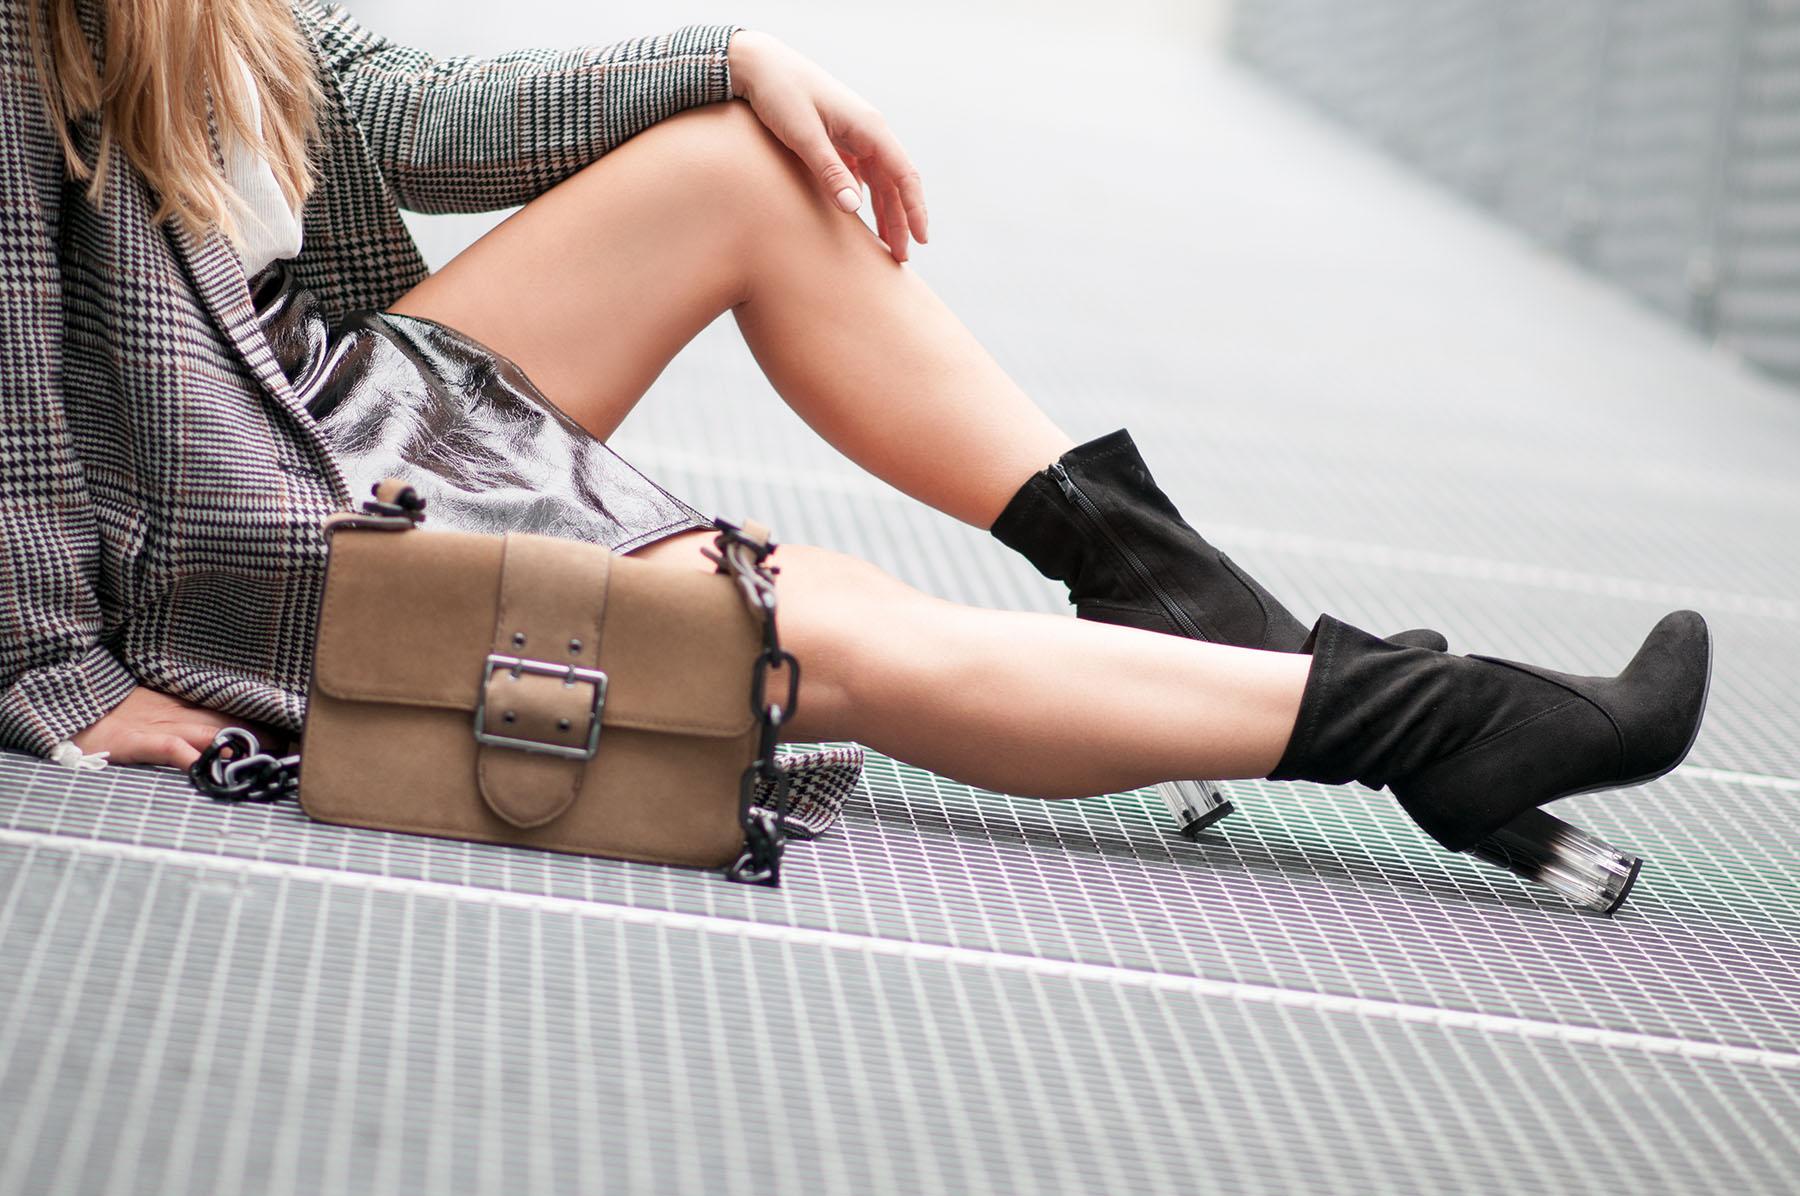 jupe vinyle vinyl skirt la minute fashion. Black Bedroom Furniture Sets. Home Design Ideas